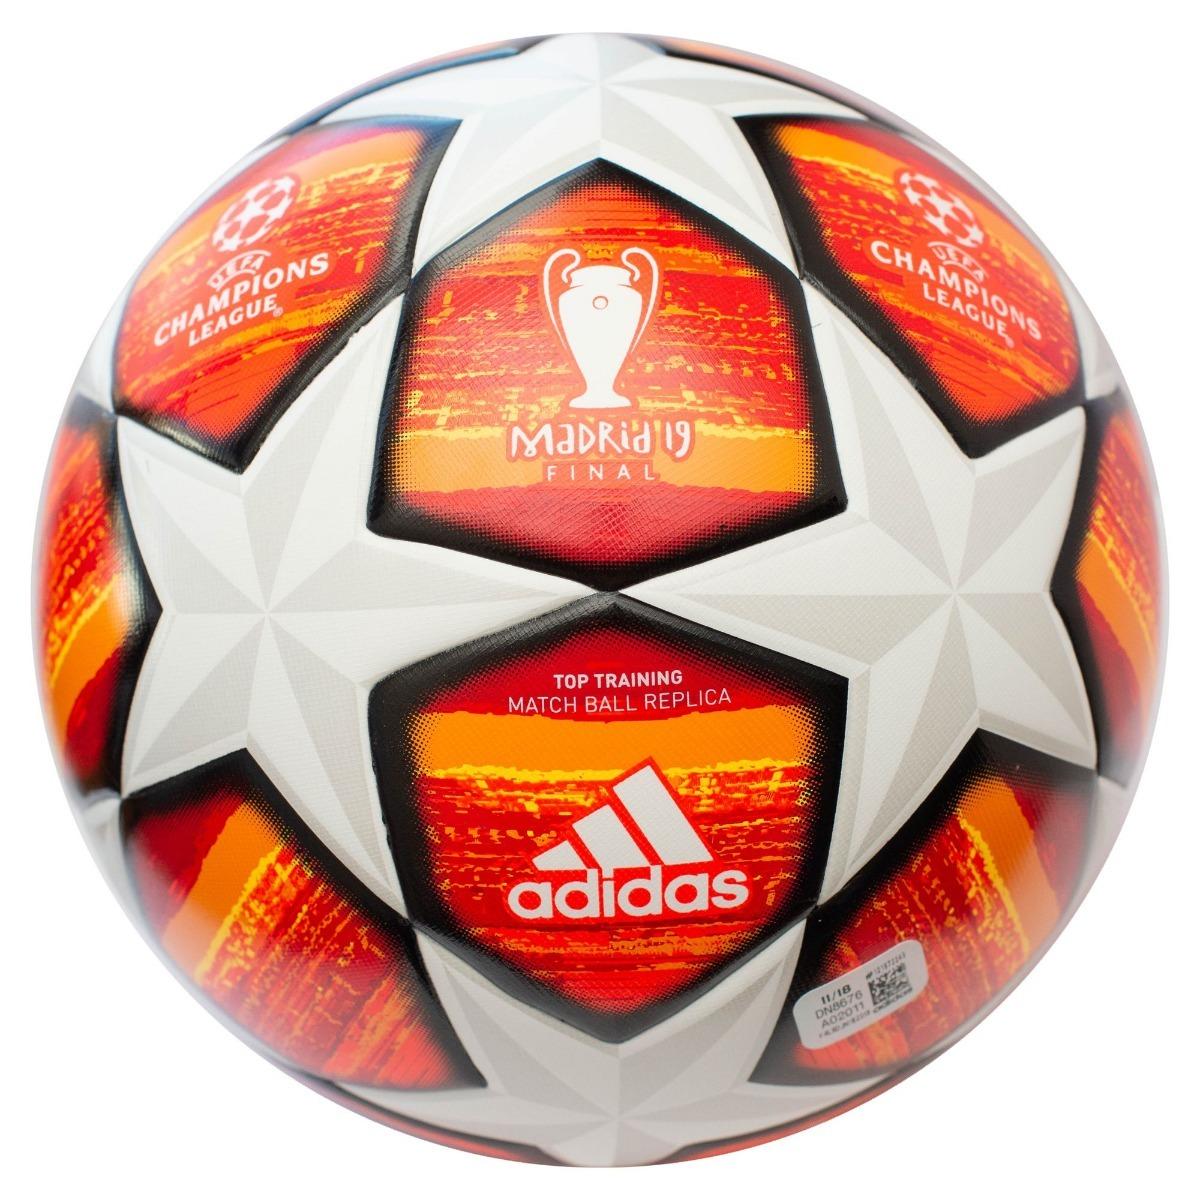 c8989c0973e60 bola oficial adidas uefa champions league madrid 2019 campo. Carregando  zoom.